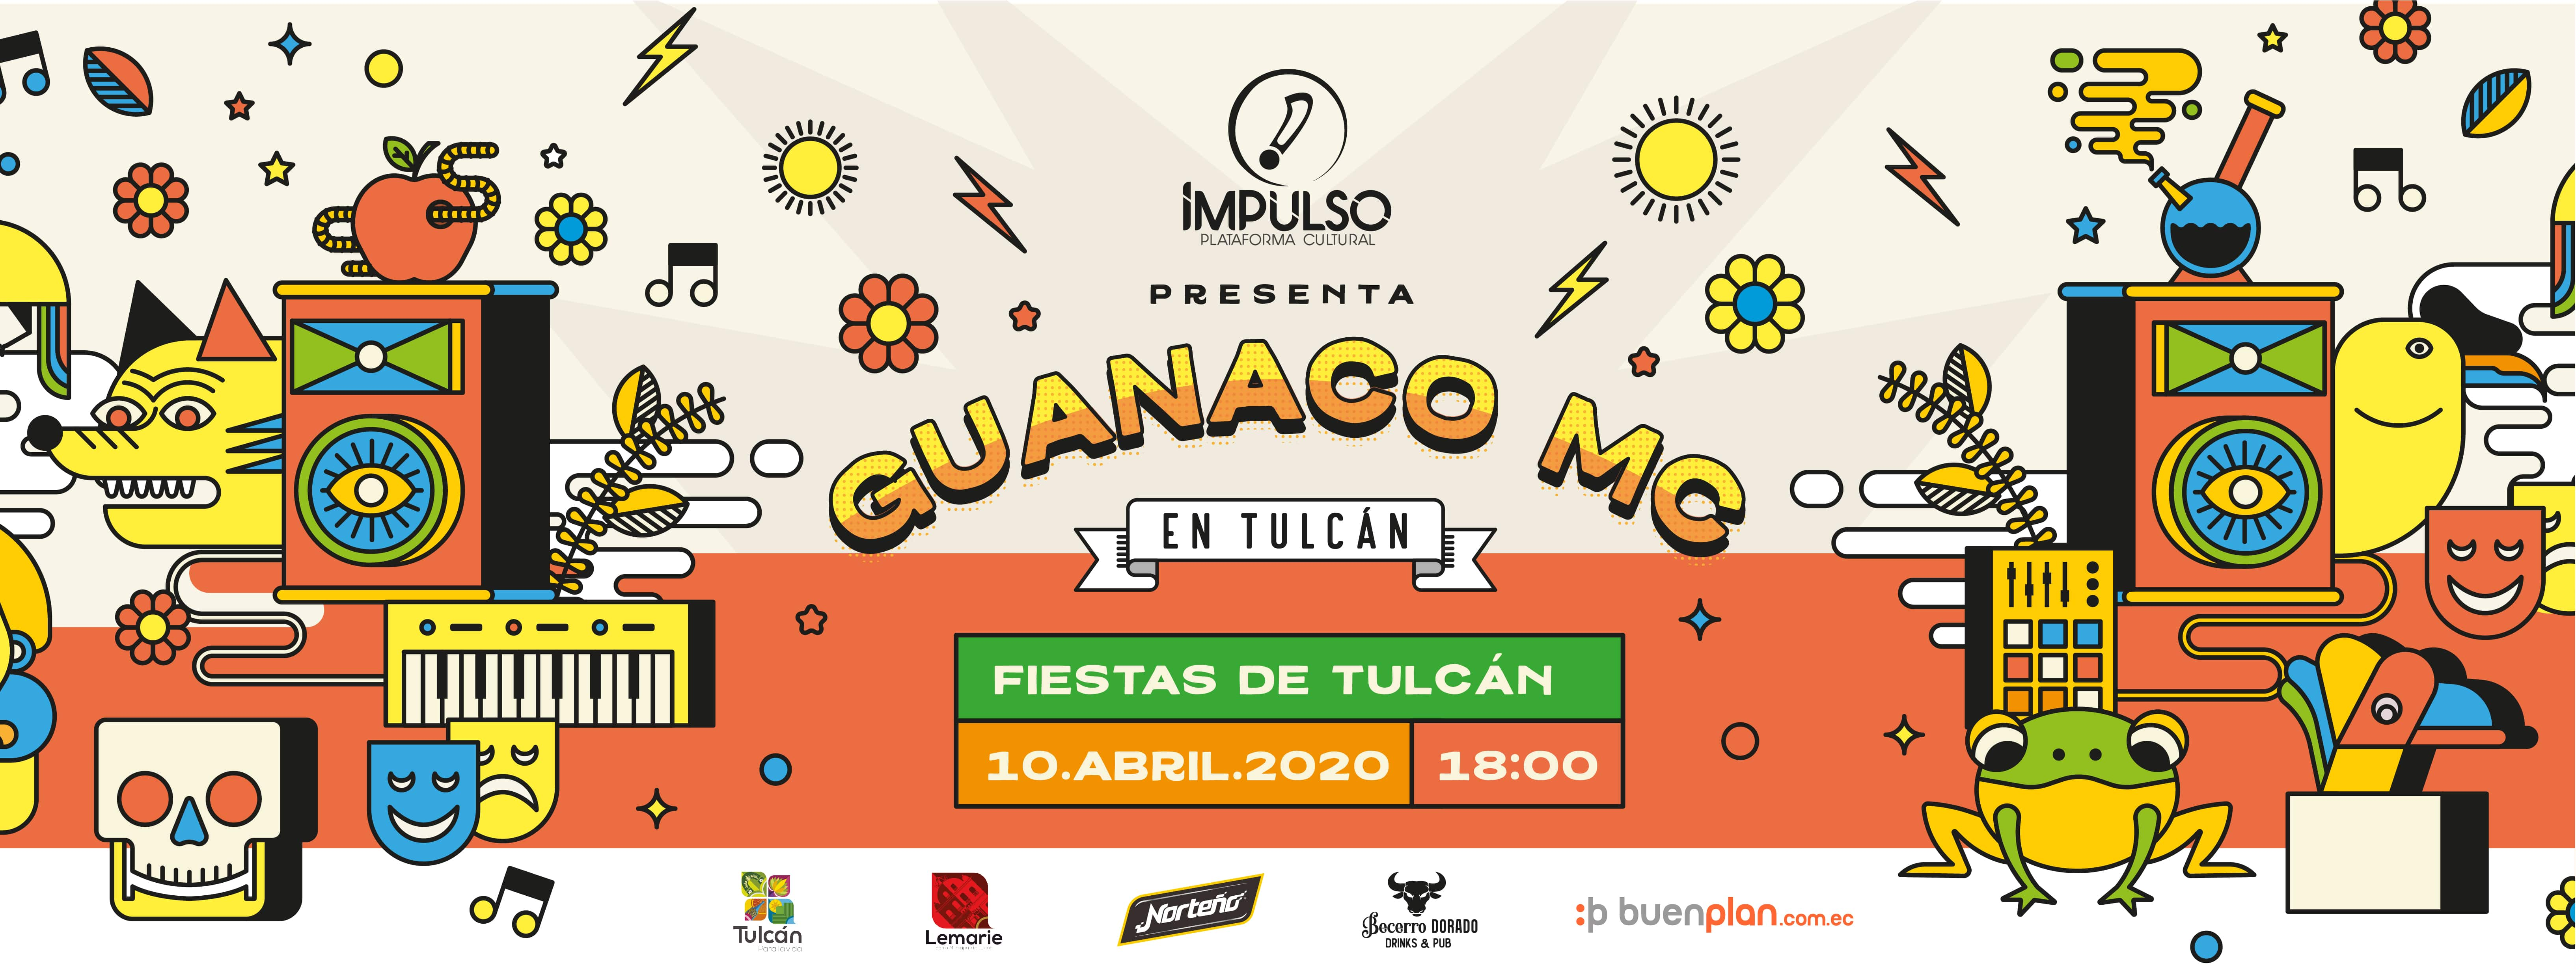 Guanaco Mc en Tulcán en Tulcán, BuenPlan